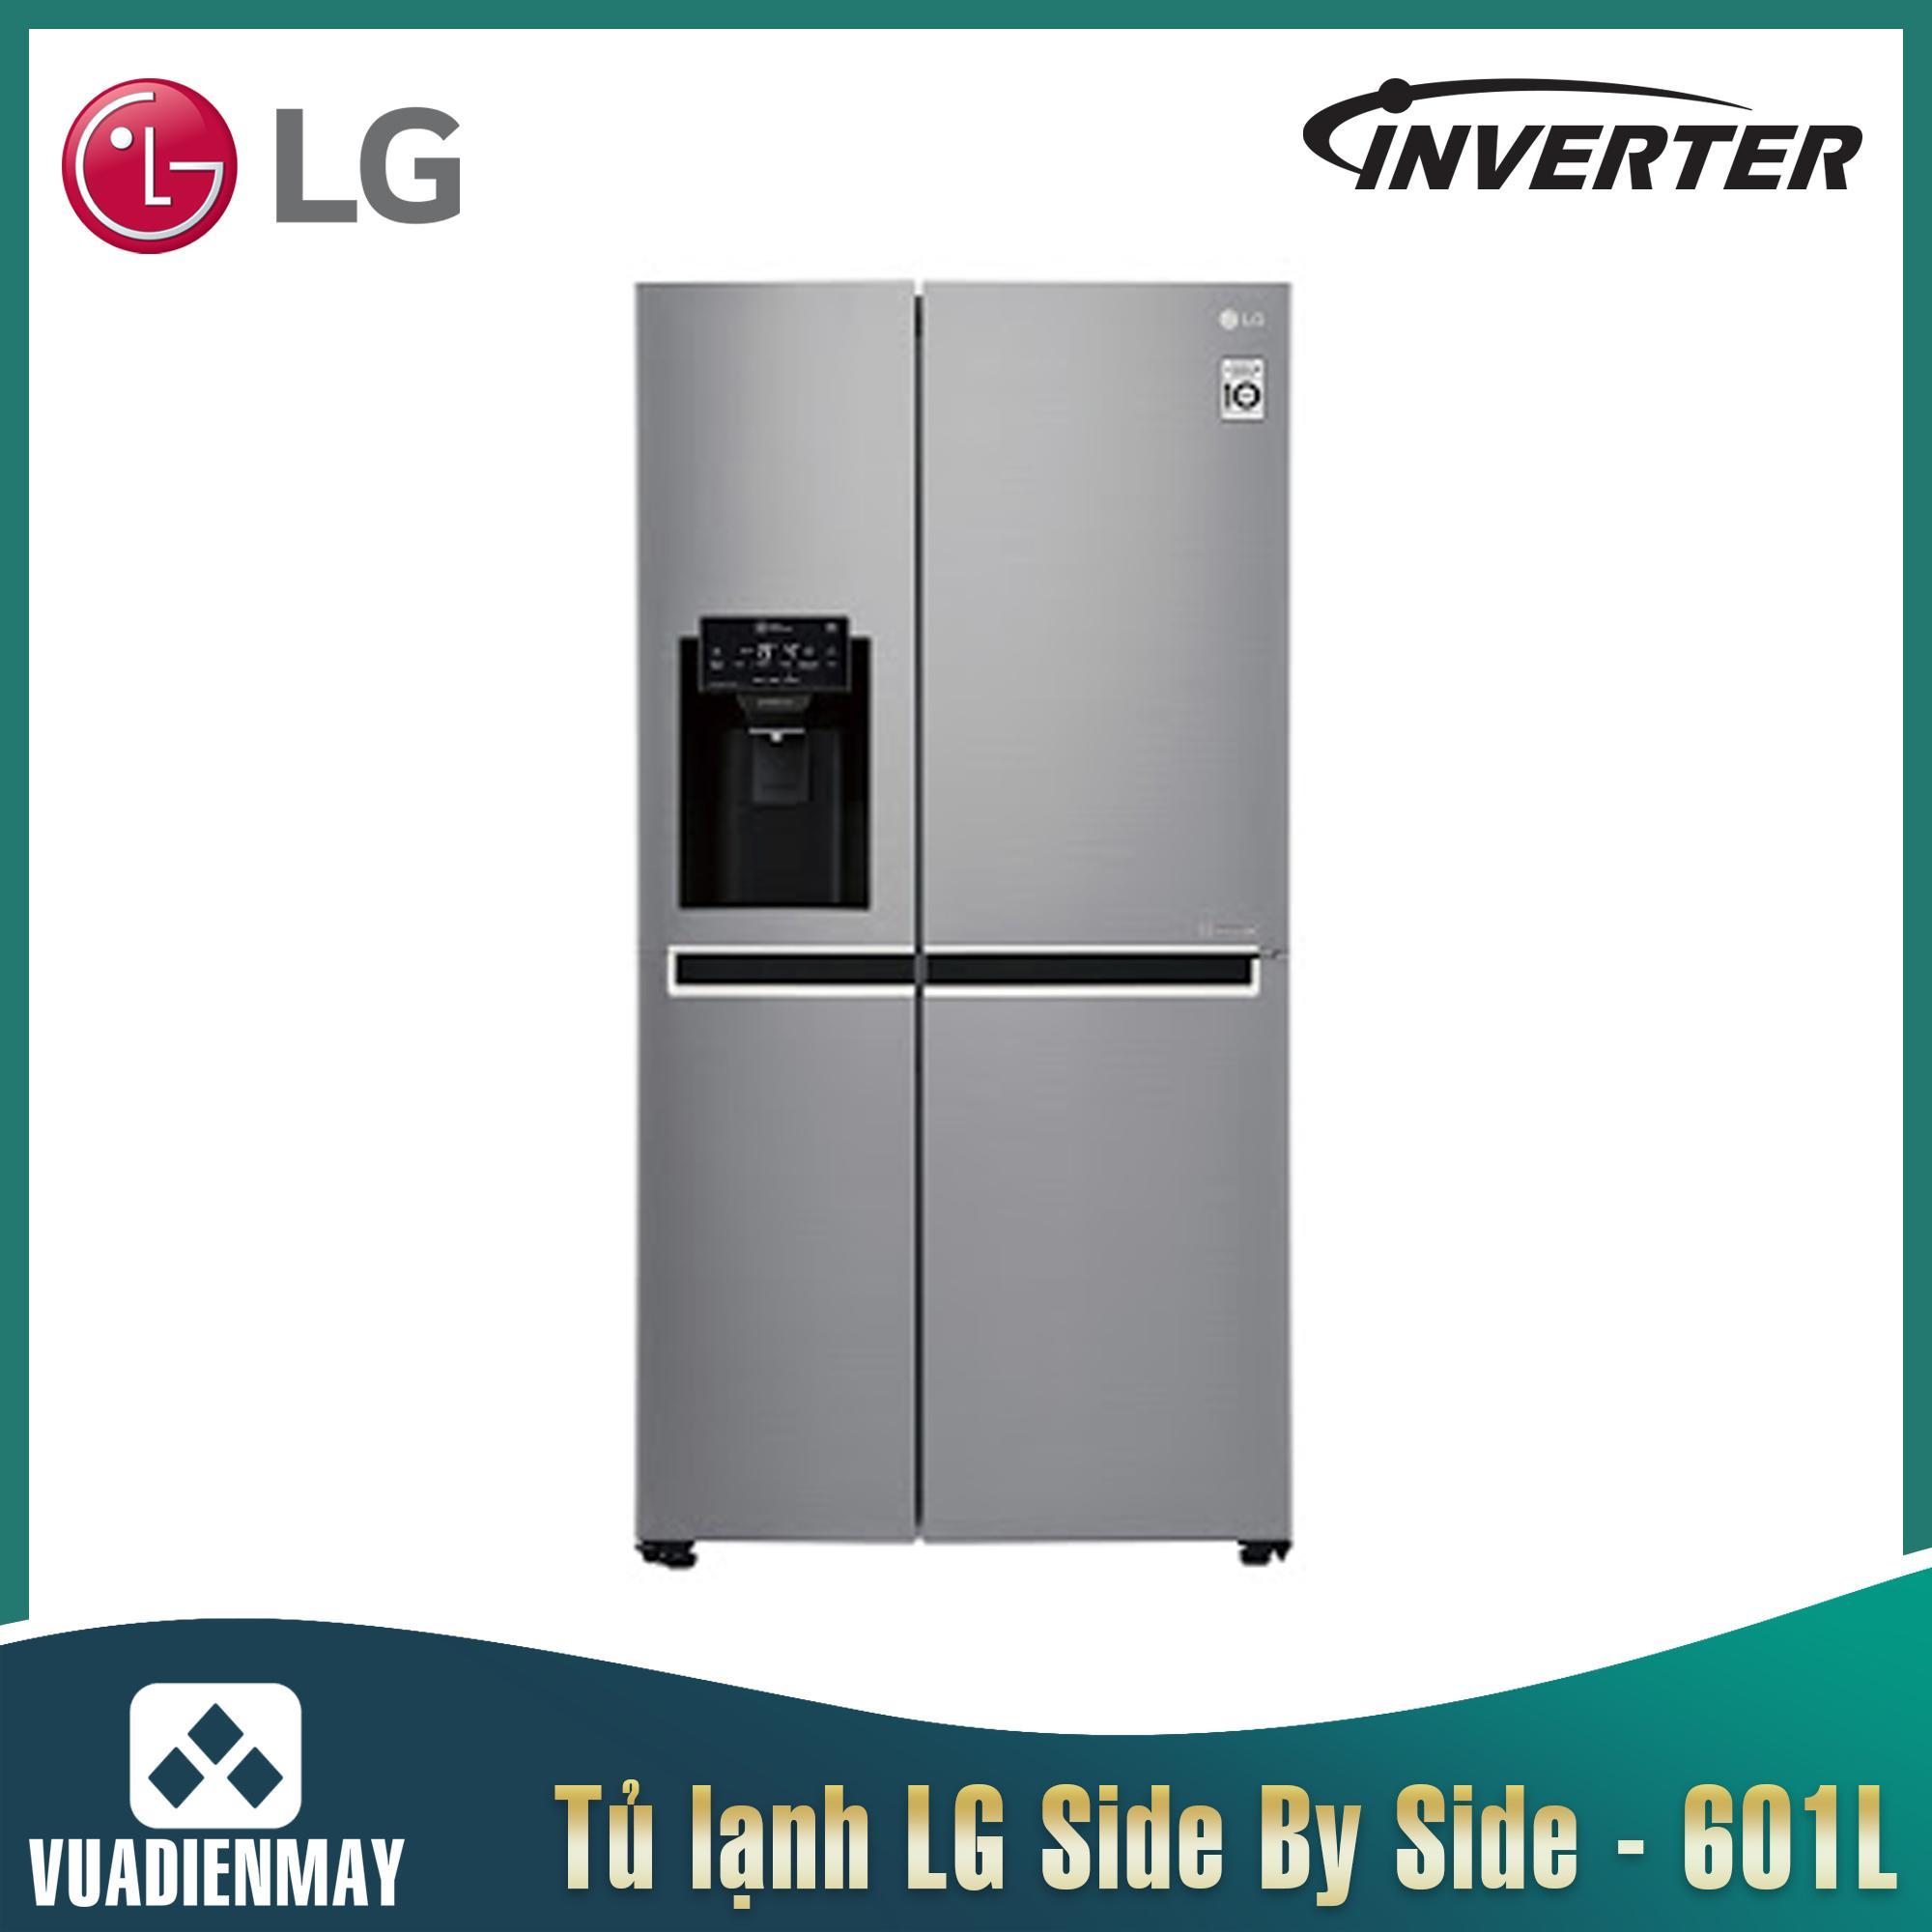 Tủ lạnh LG side-by-side inverter 601 lít